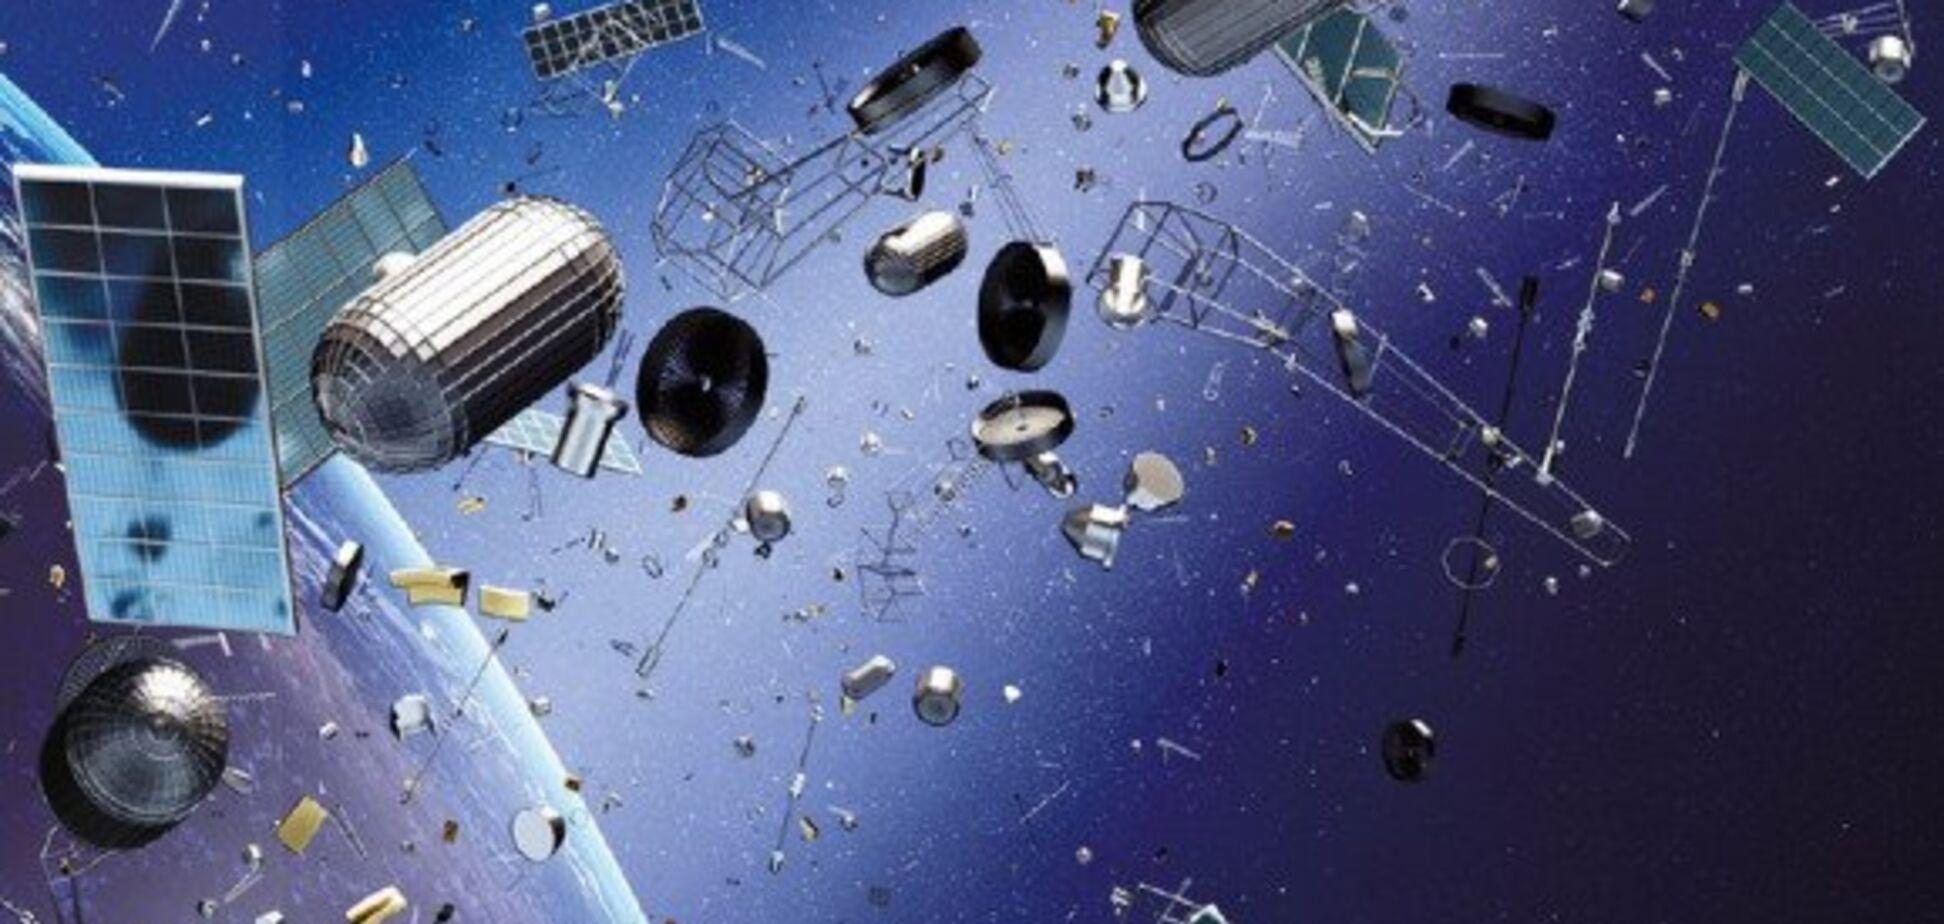 Загроза з космосу: українців попередили про смертельну небезпеку